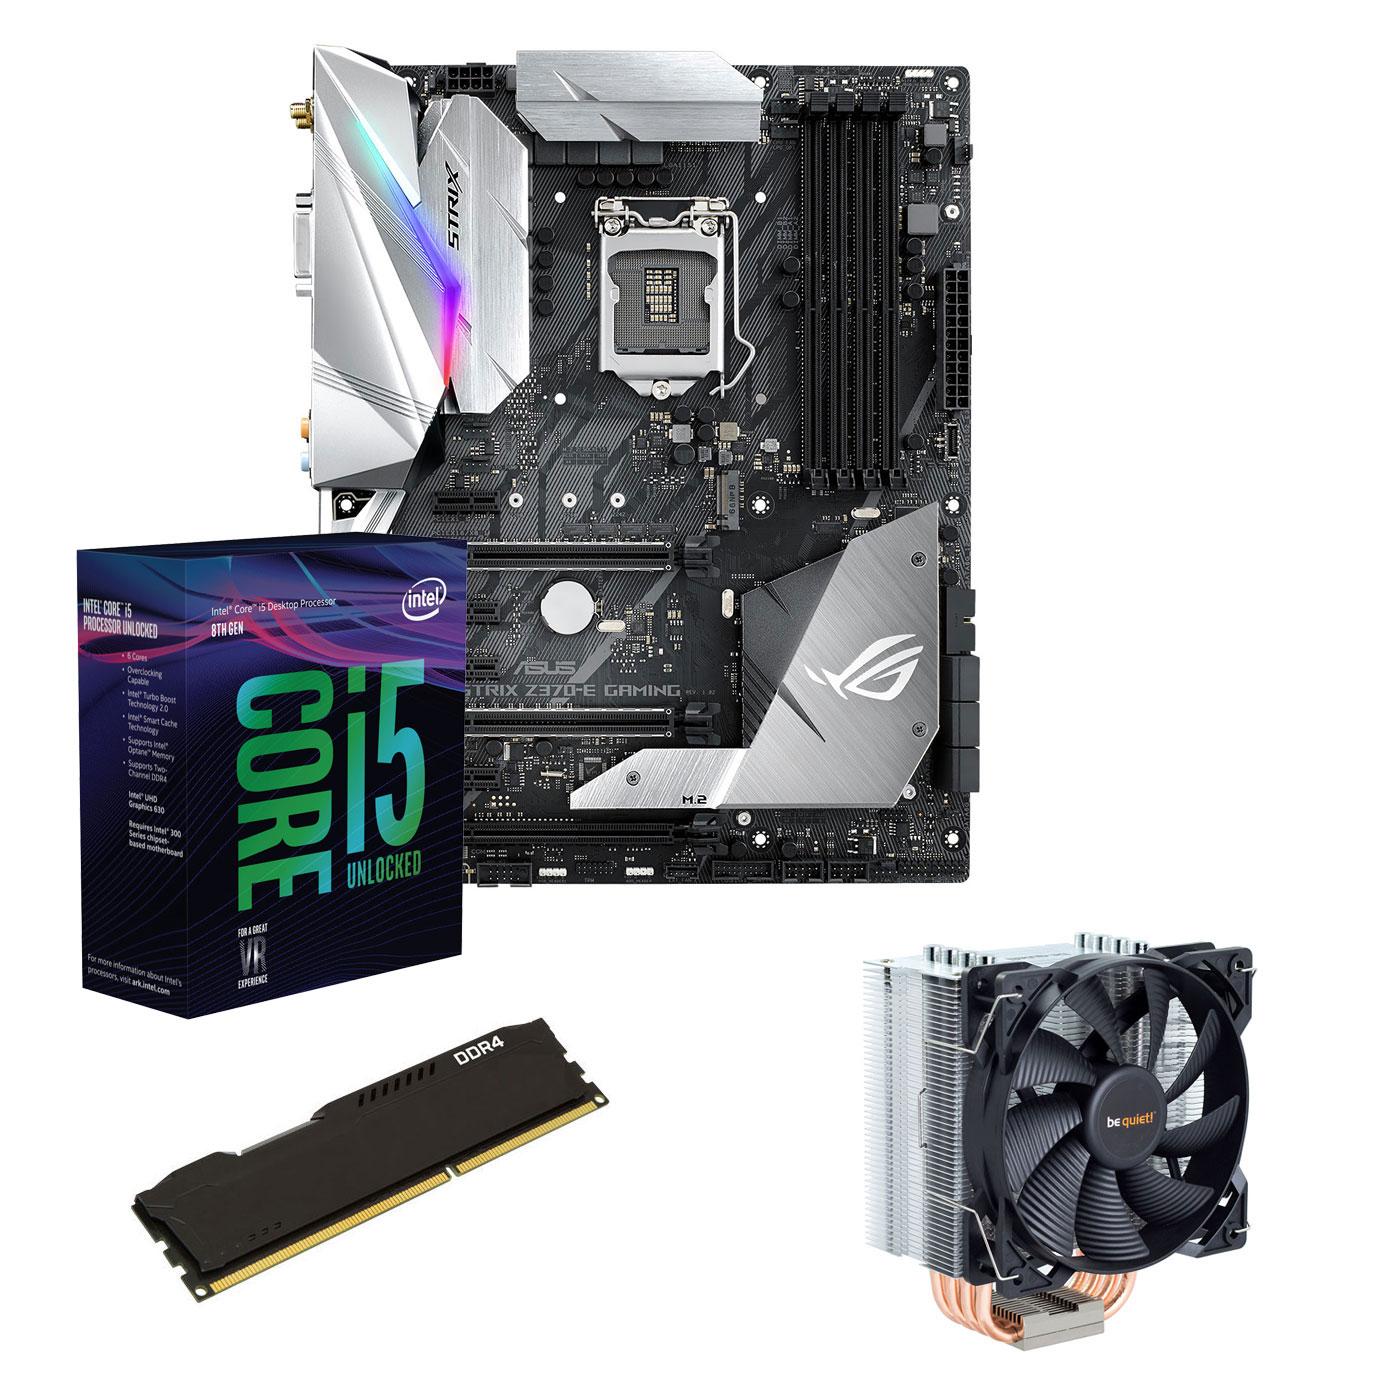 Kit upgrade PC Kit Upgrade PC Core i5K ASUS ROG STRIX Z370E GAMING 8 Go Carte mère Socket 1151 Intel Z370 Express + CPU Intel Core i5-8600K (3.6 GHz) + RAM 8 Go DDR4